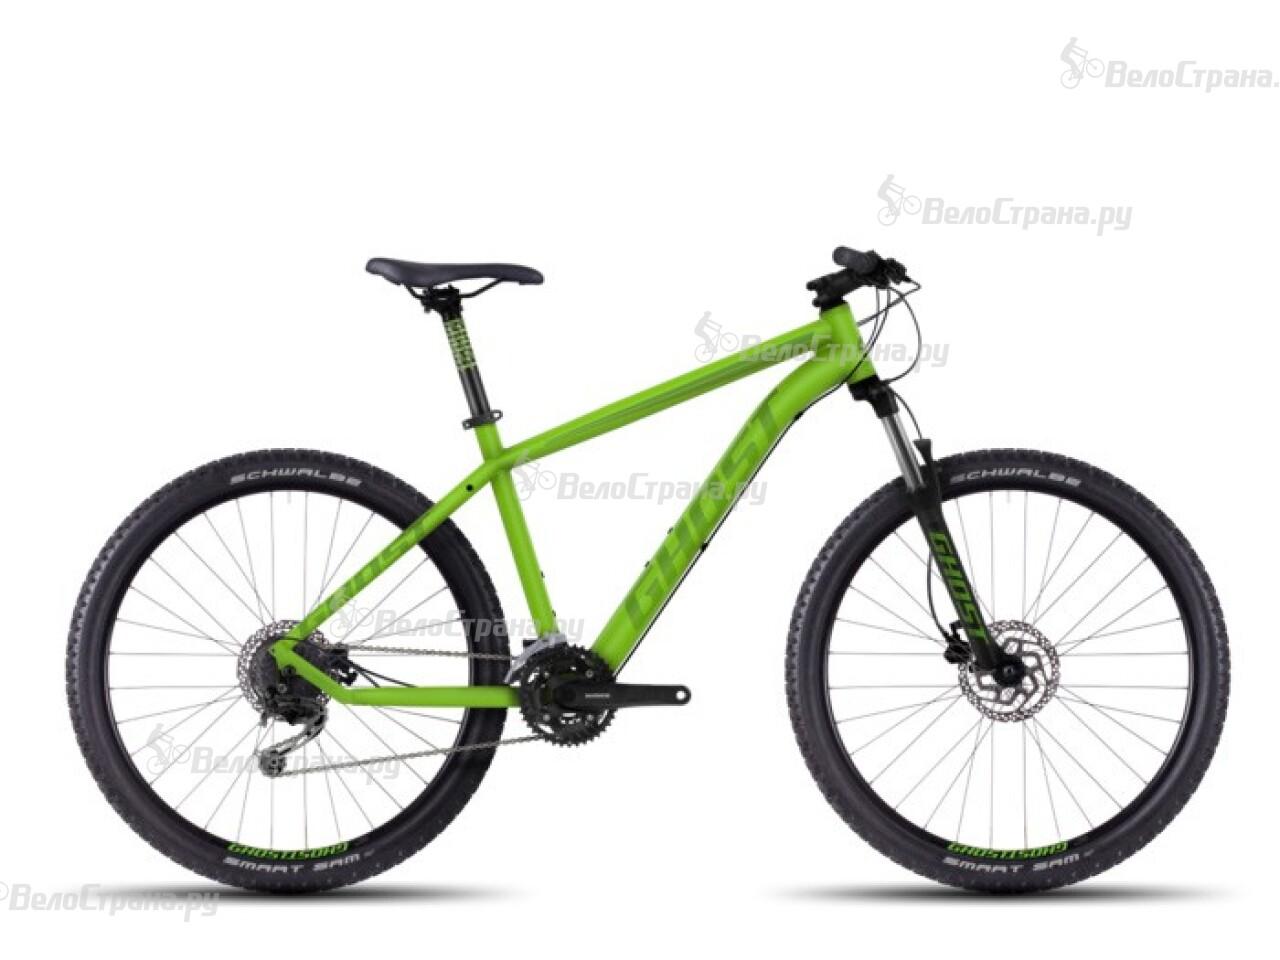 Велосипед Ghost Kato 3 (2016) цены онлайн